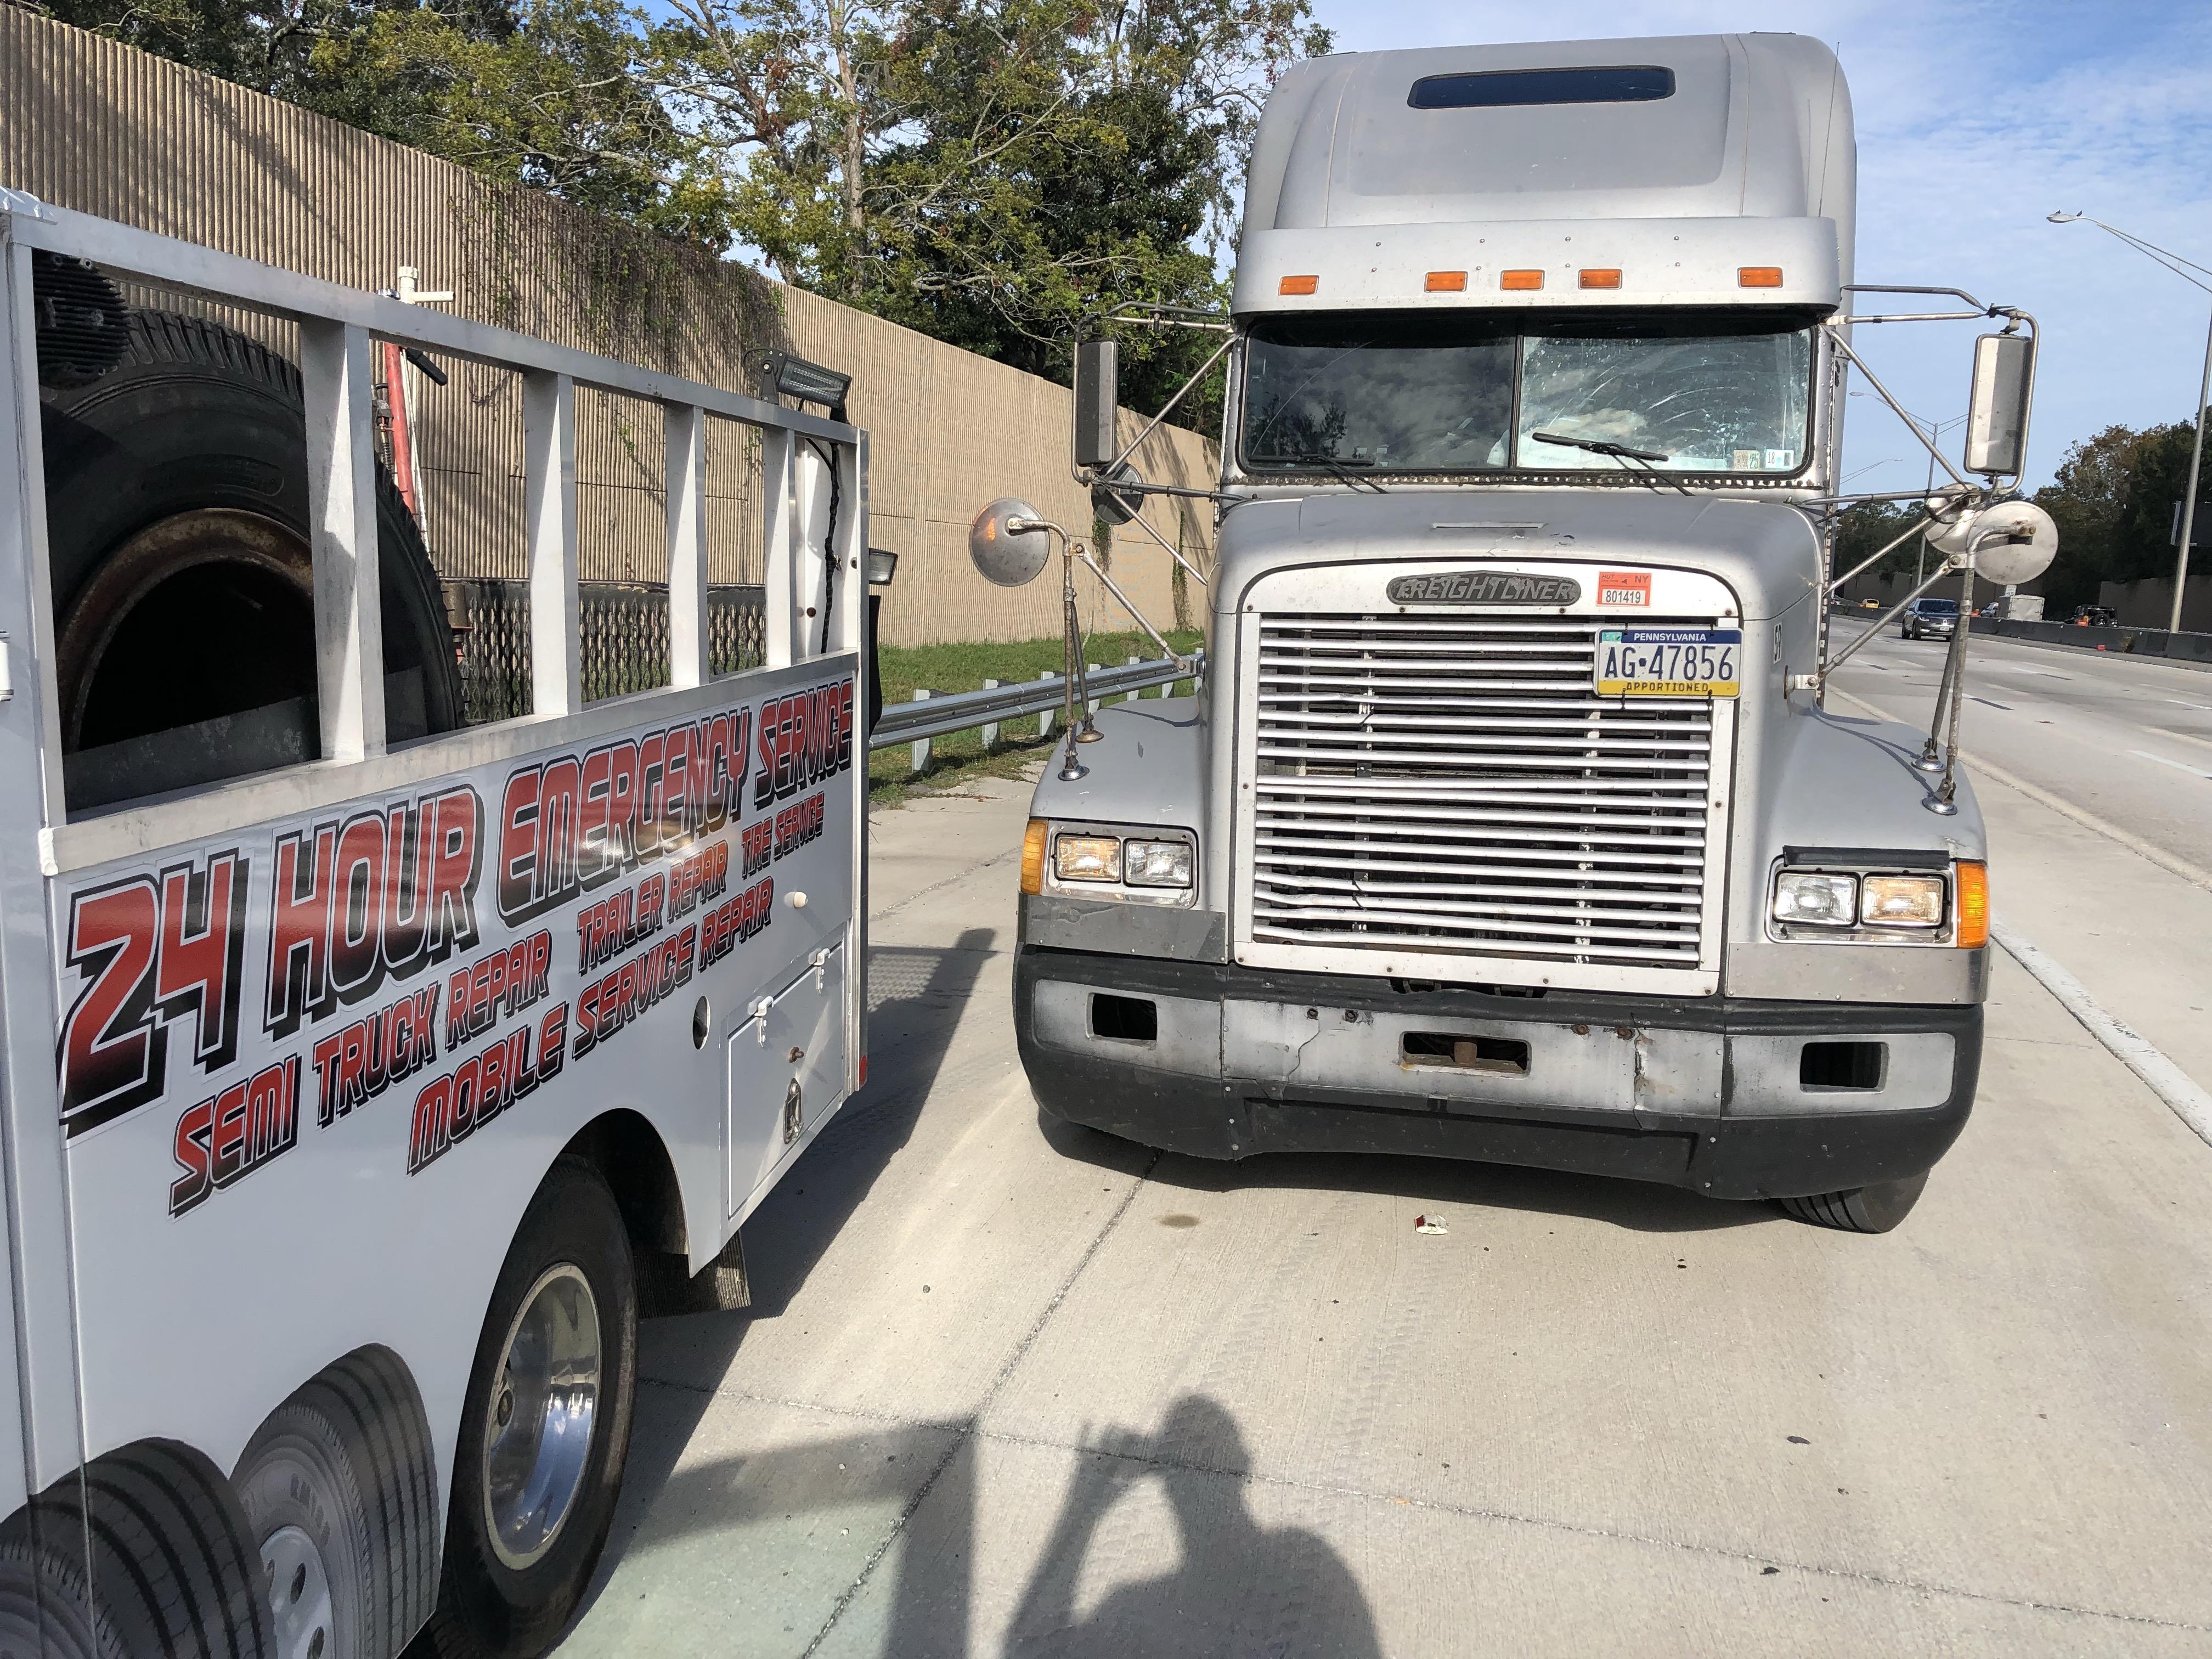 Southern Tire Fleet Service Llc 24 7 Tire Trailer Repair